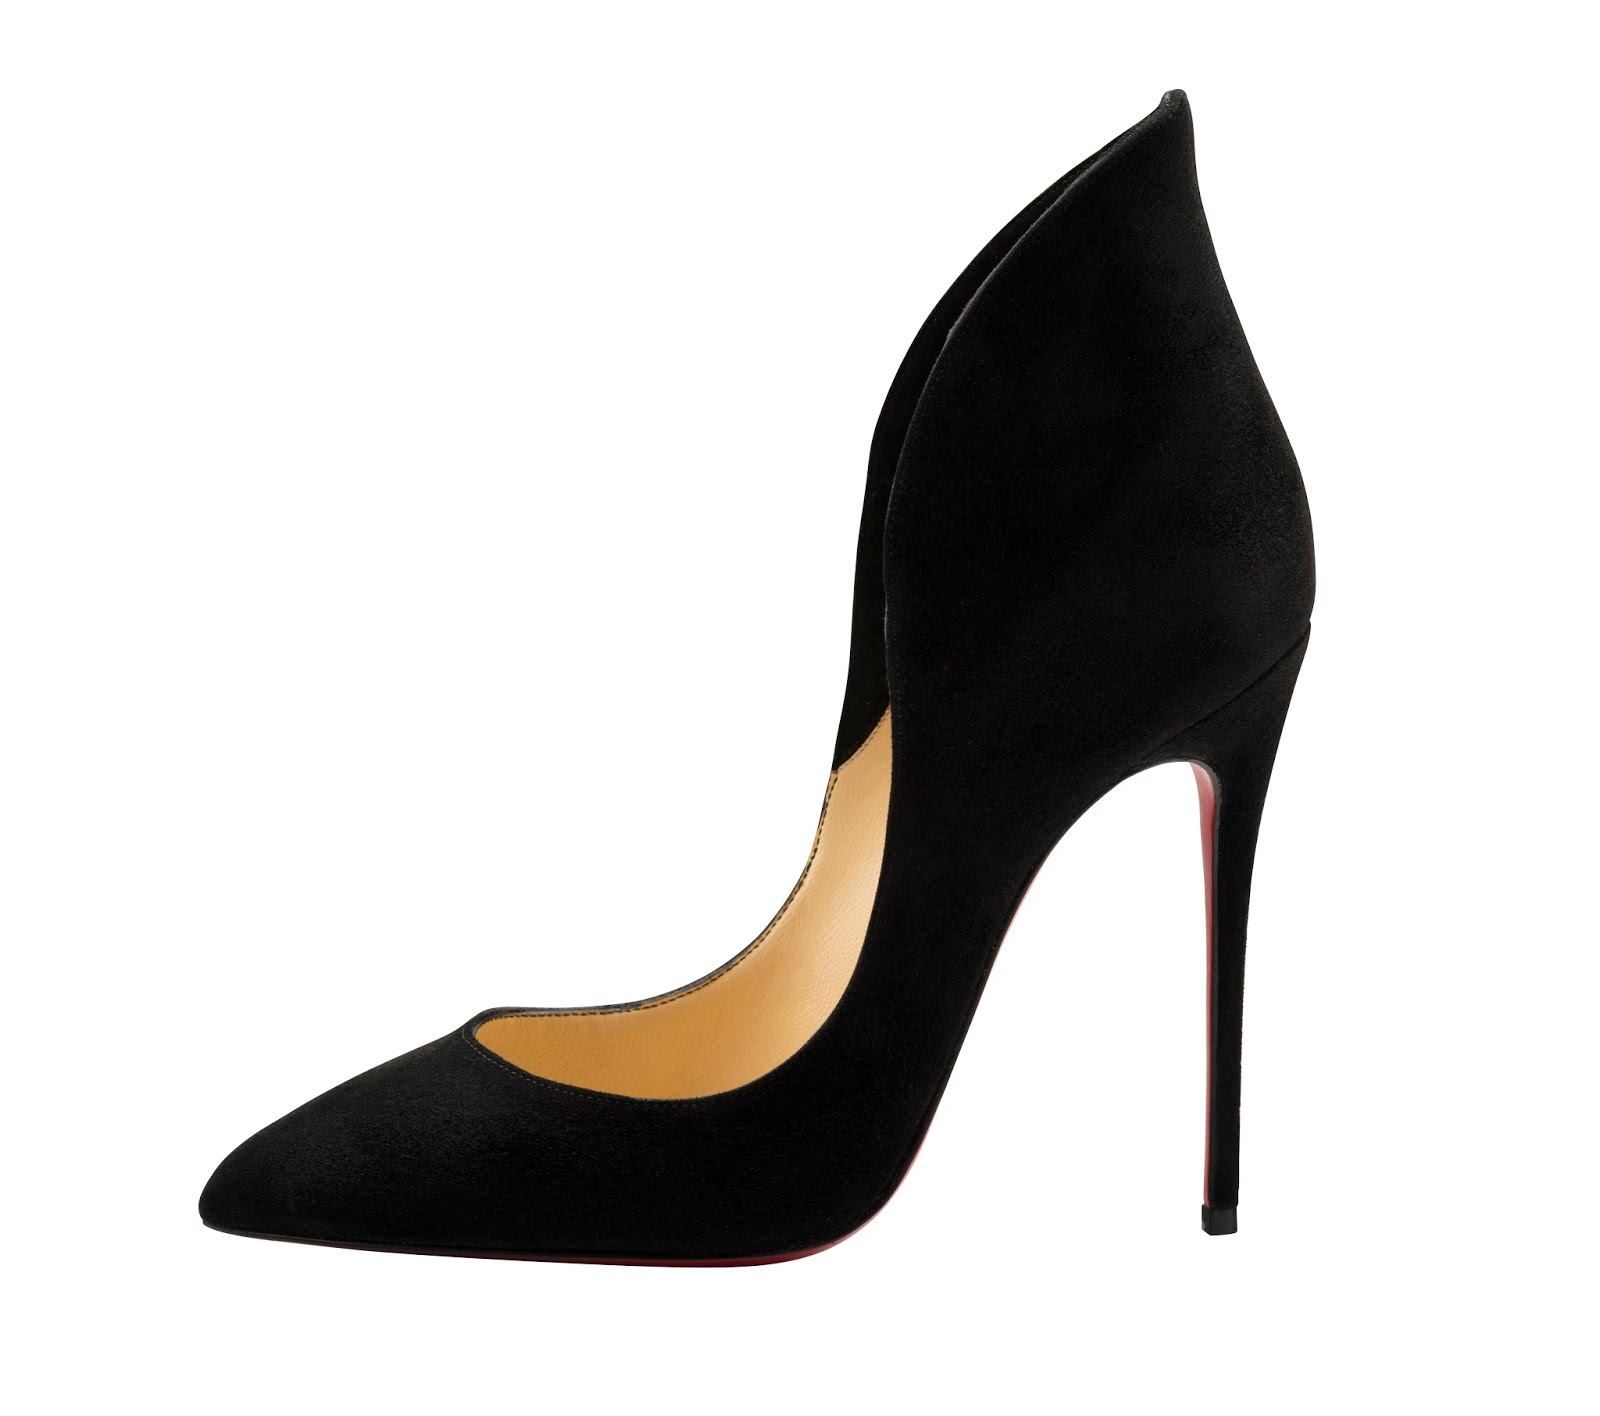 Christian Louboutin  Shoes Do   Don t  3c0c1847f85a